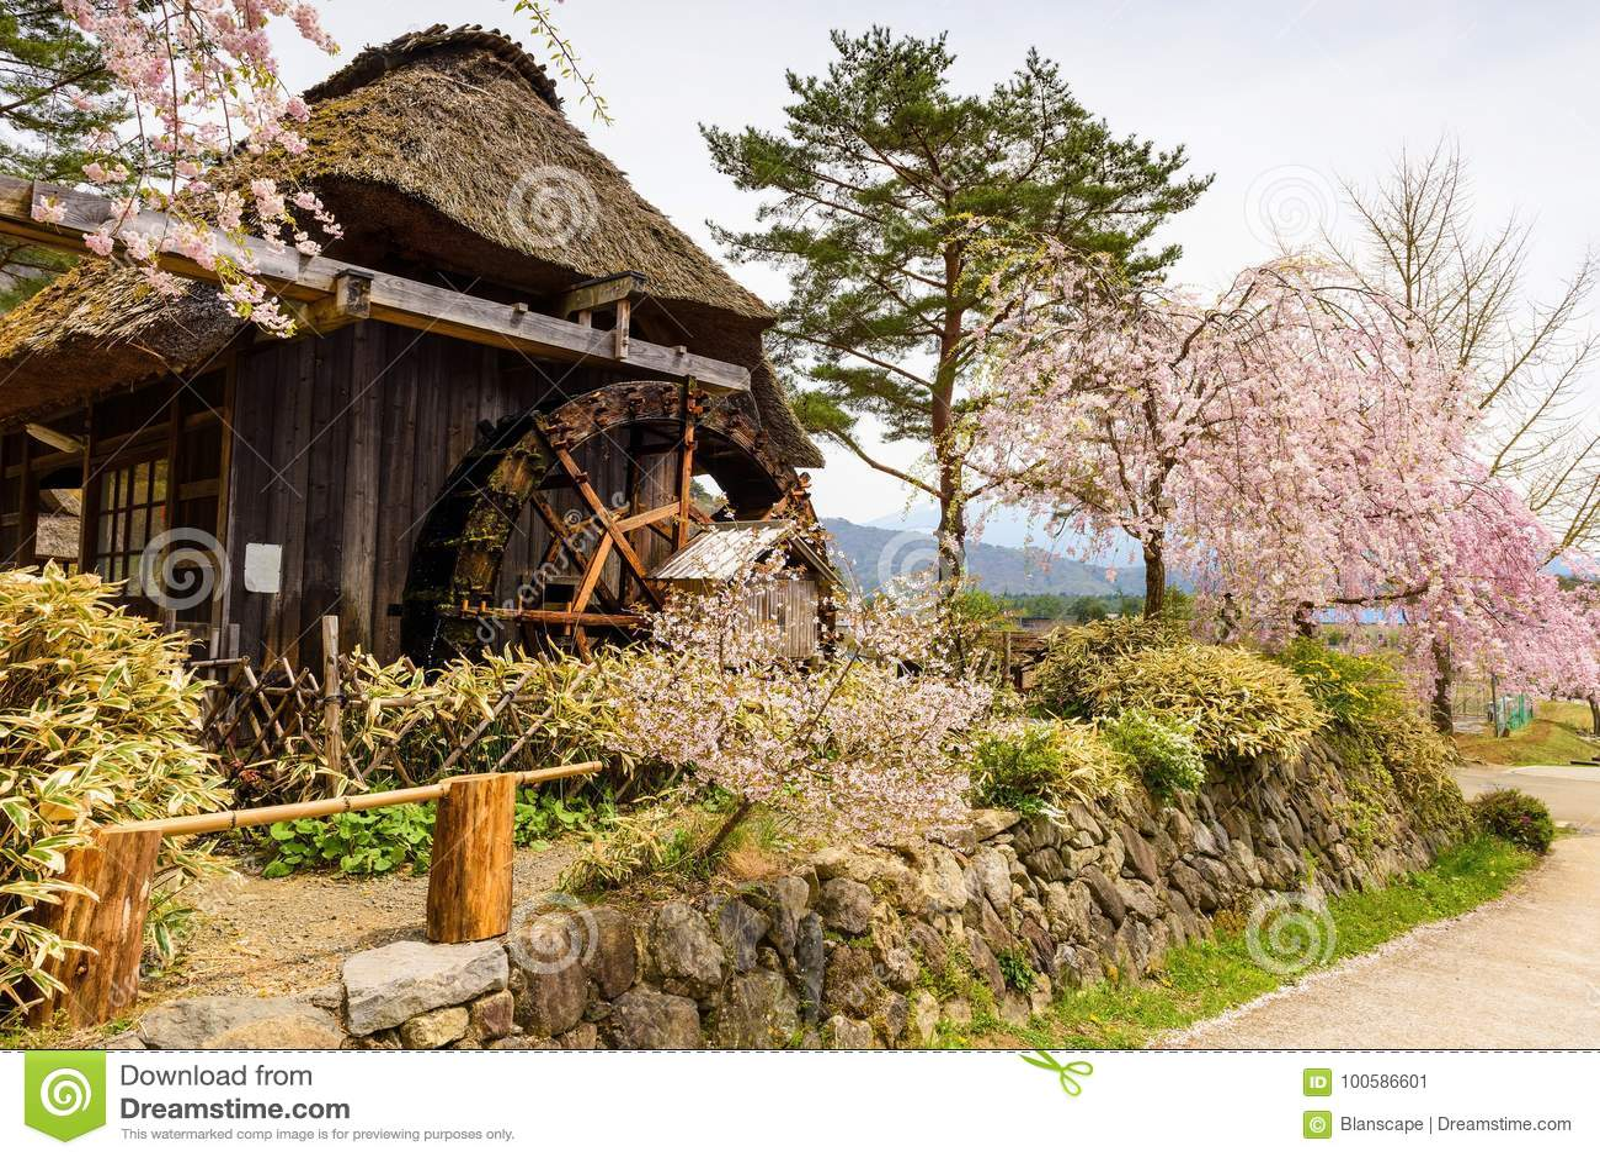 Met stro bedekt blokhuis met roze Kersenbloesem